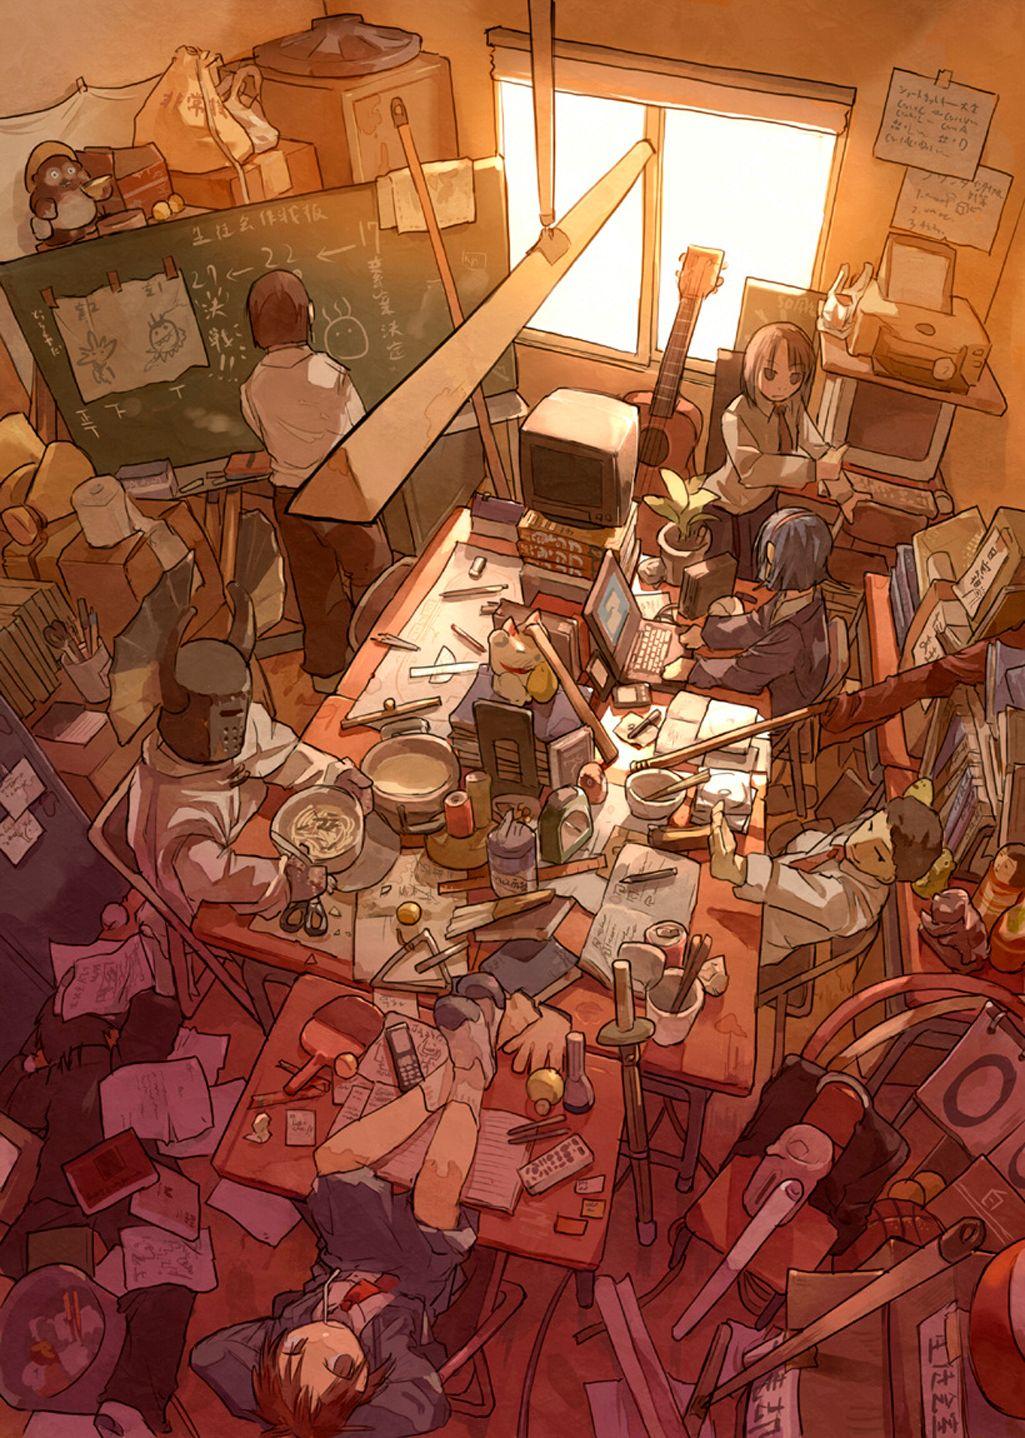 The Art Of Animation Animation Art Art Anime Scenery